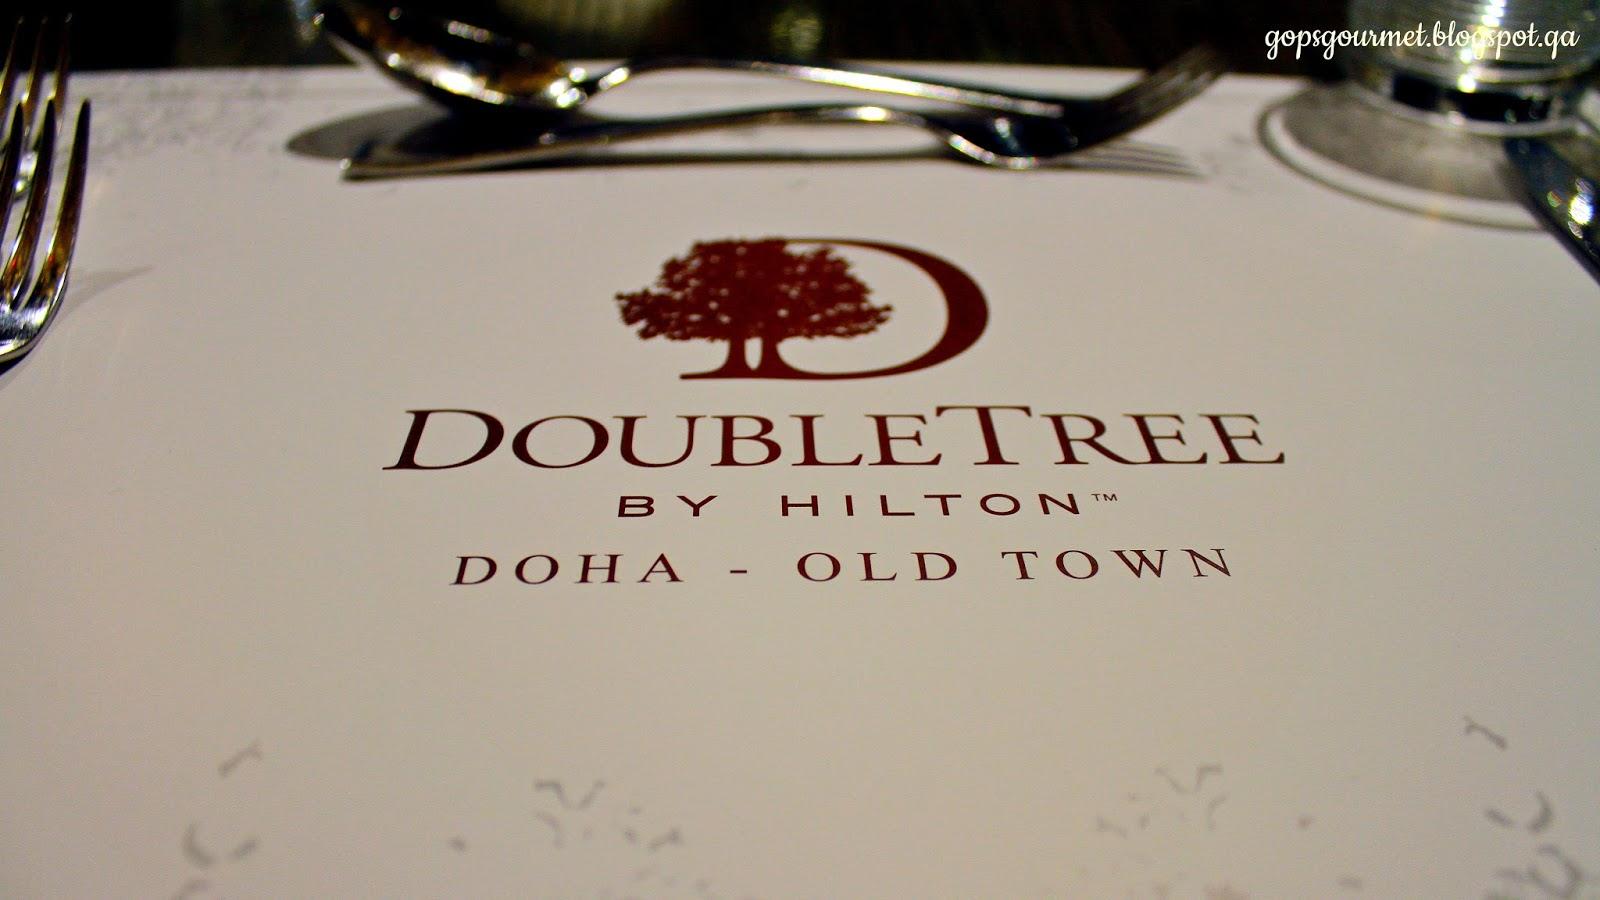 gop' s gourmet: l2 doubletree, hilton doha